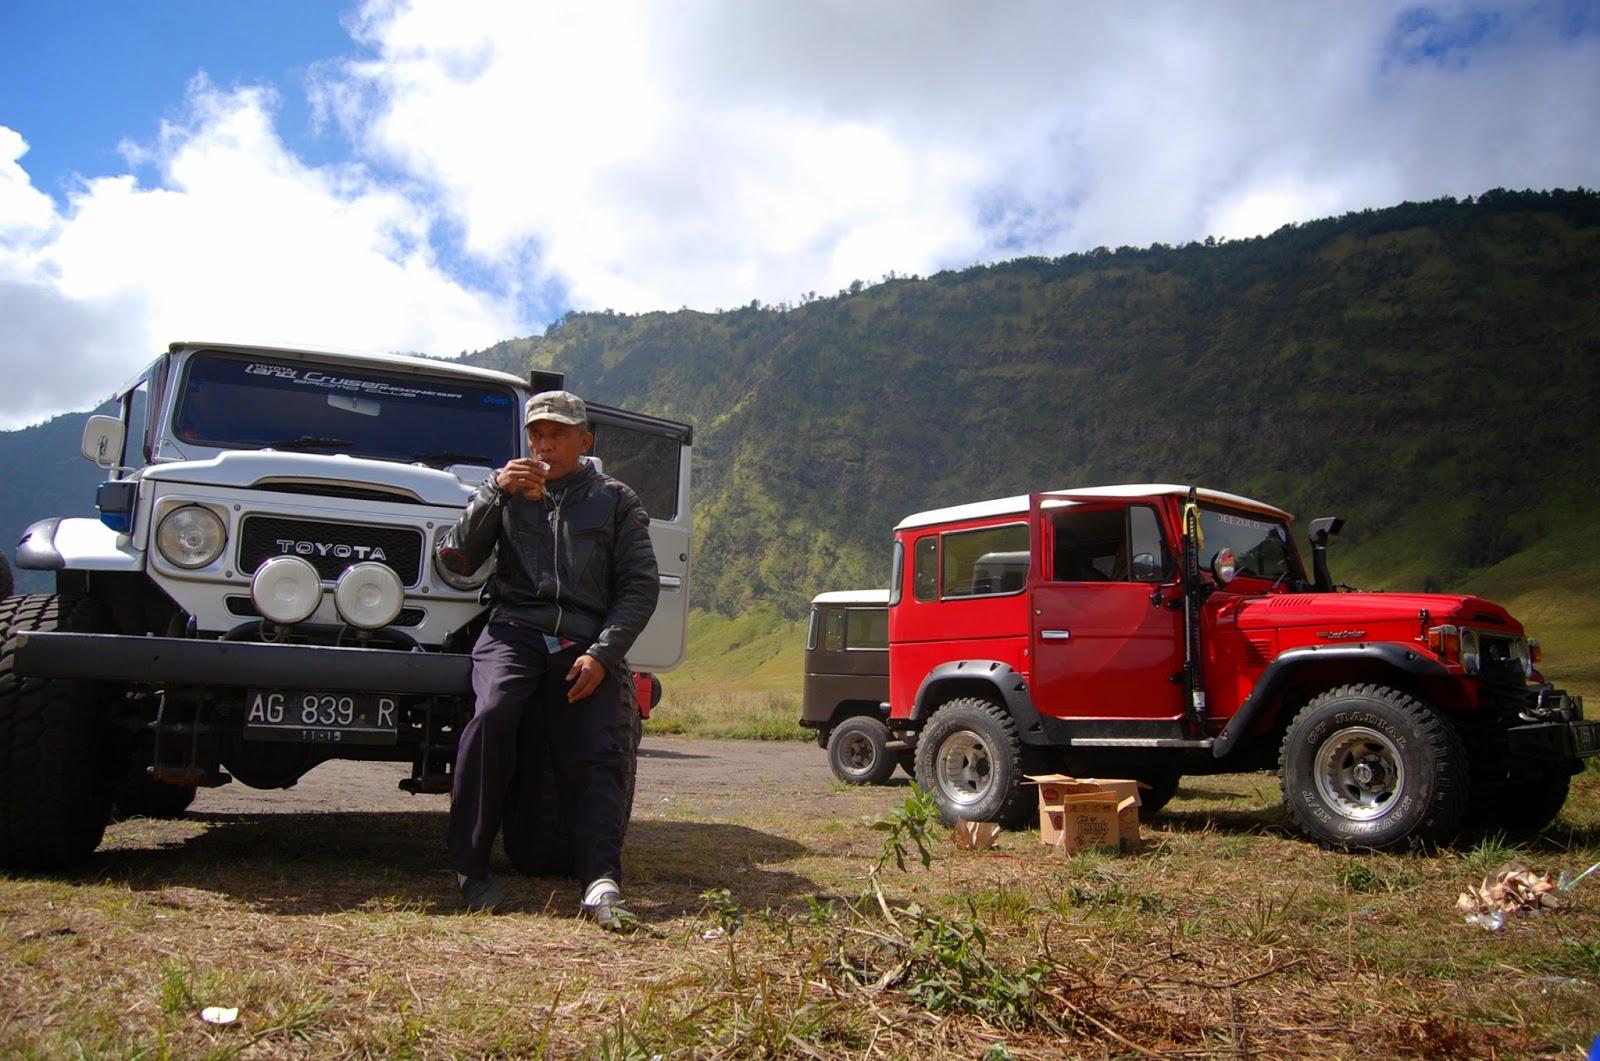 Menjelajahi Gunung Bromo Yang Eksotis